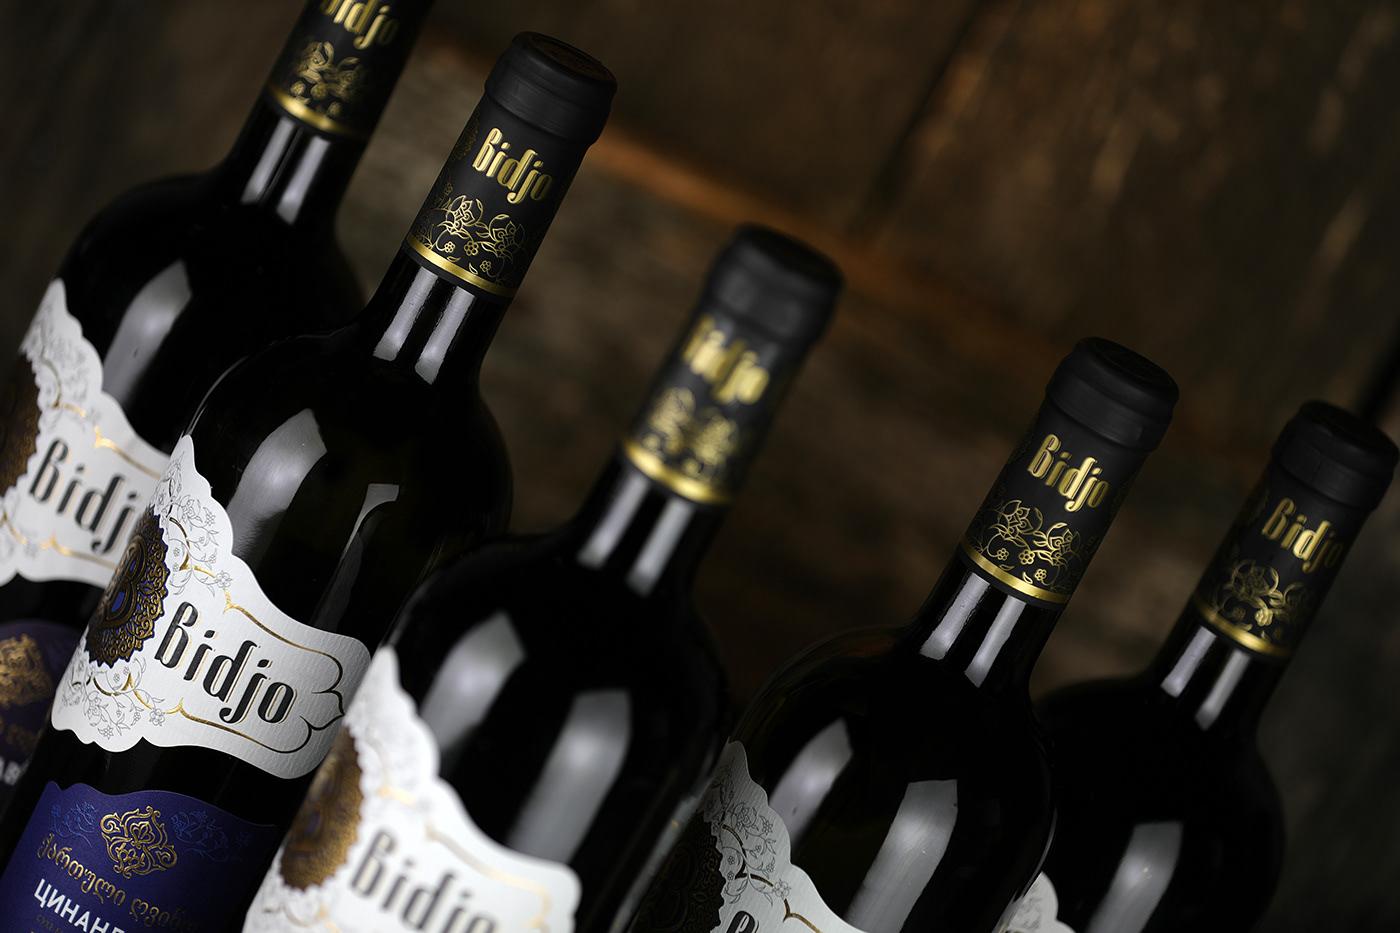 bidjo branding  wine georgian wine Sumilov shumilov shumi love design agency design Packaging